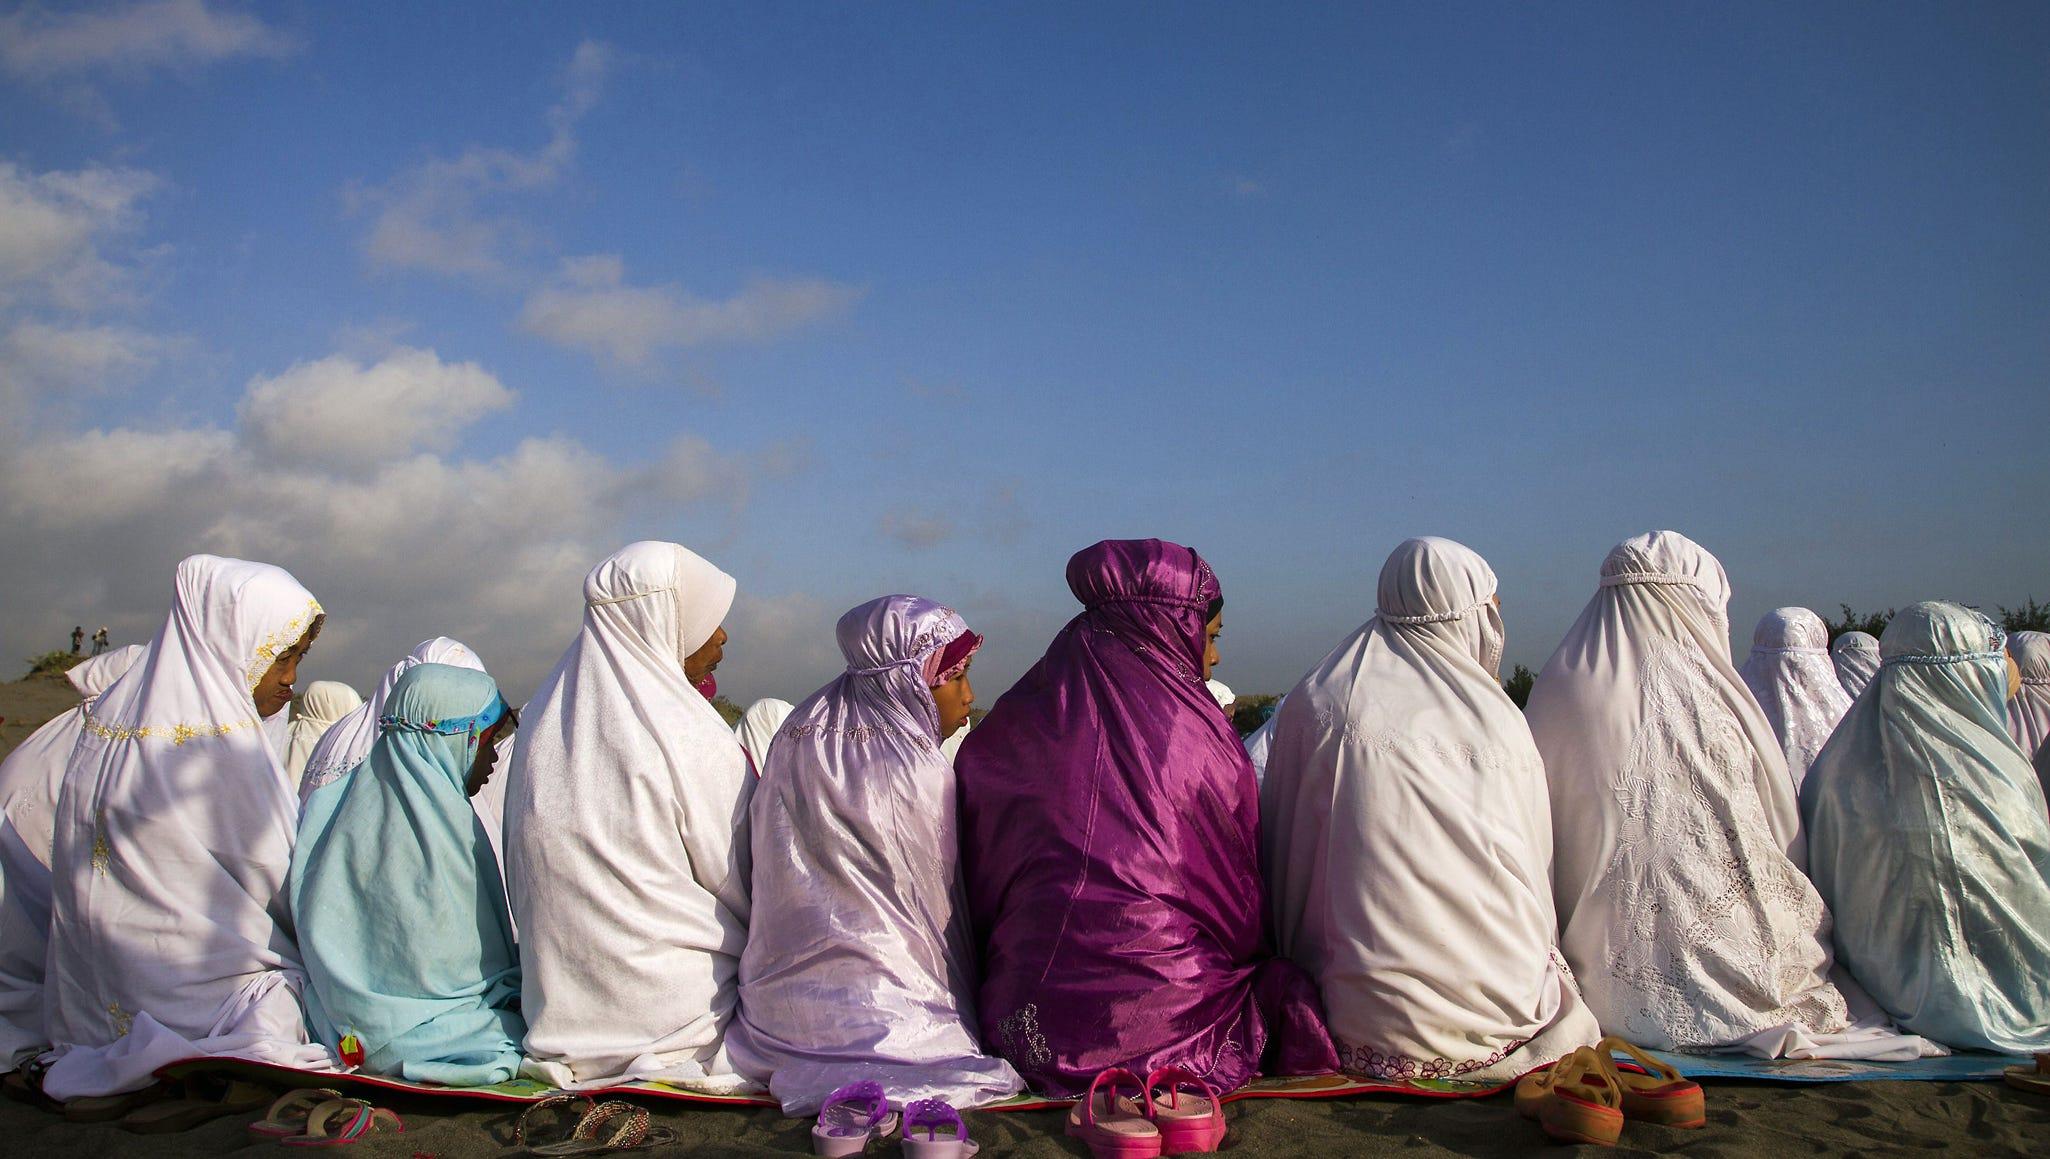 Indonesian Muslims attend early morning Eid al-Fitr prayers near the coast in Bantul, Yogyakarta, in central Java island on Aug. 8.